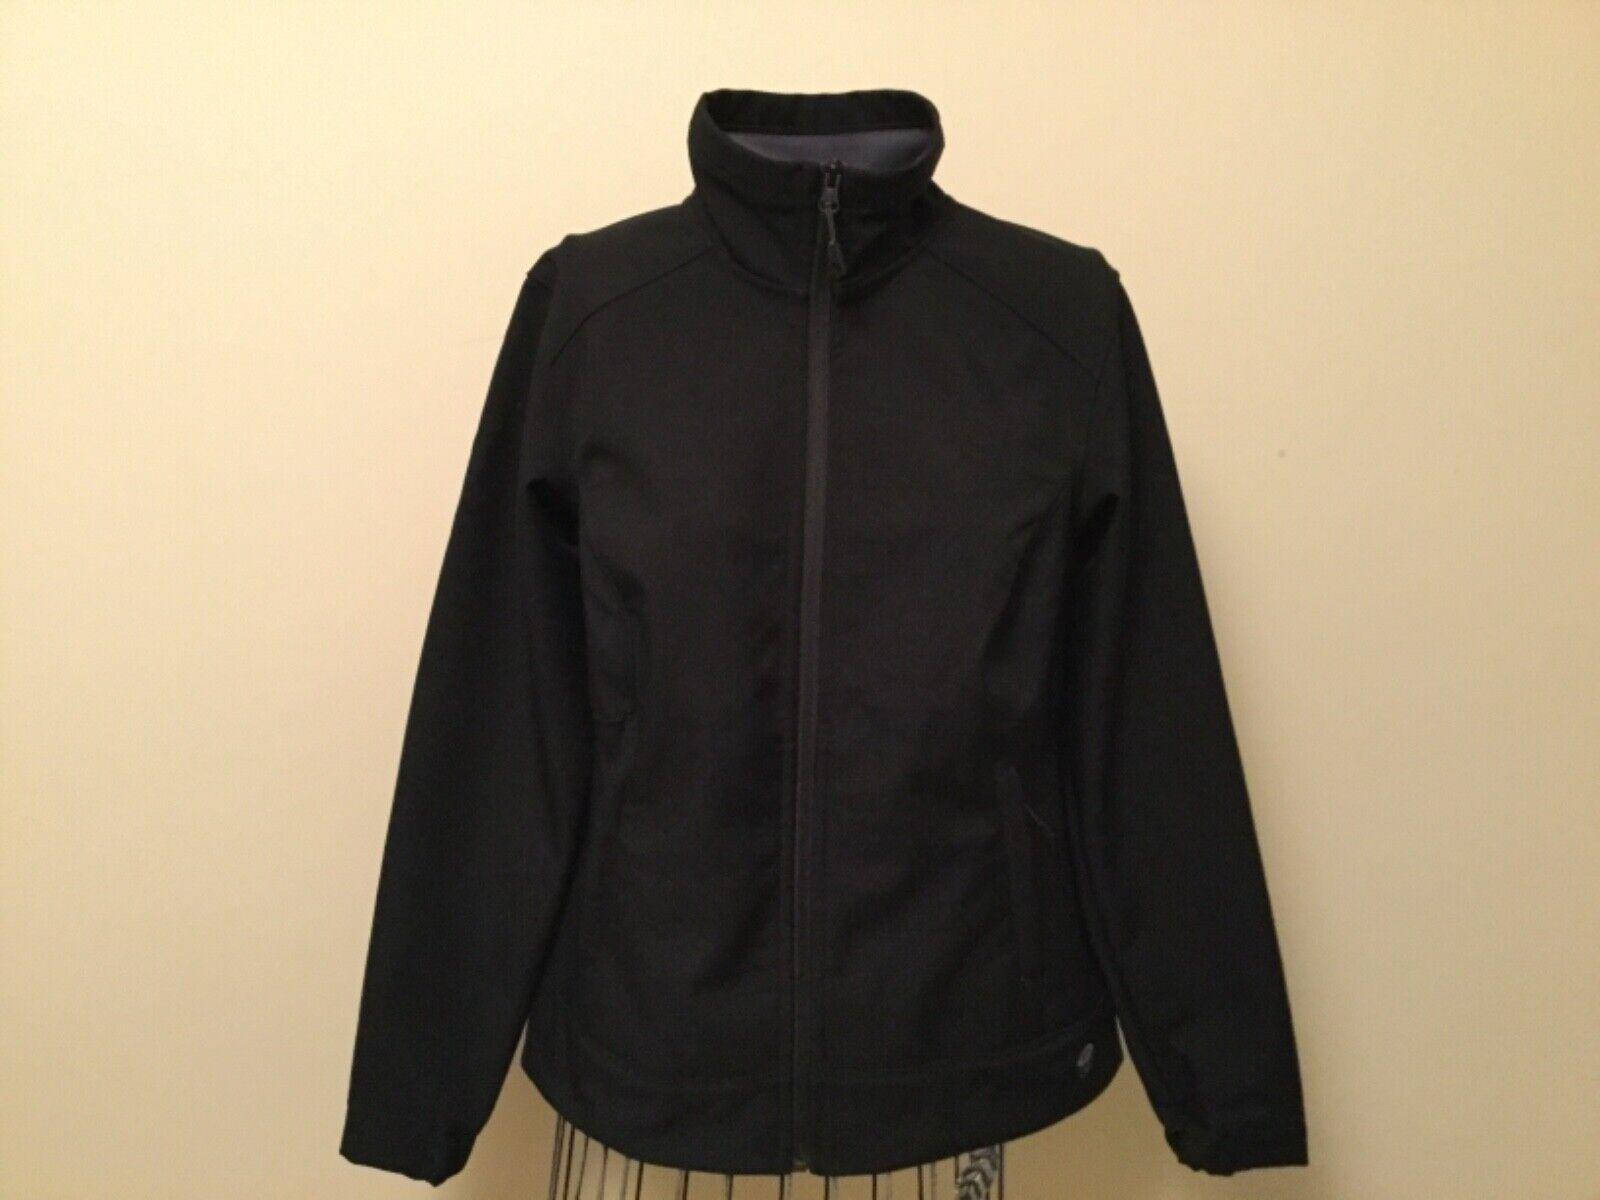 Mountain Hardwear black Solamere sport Jacket, Size M, new.